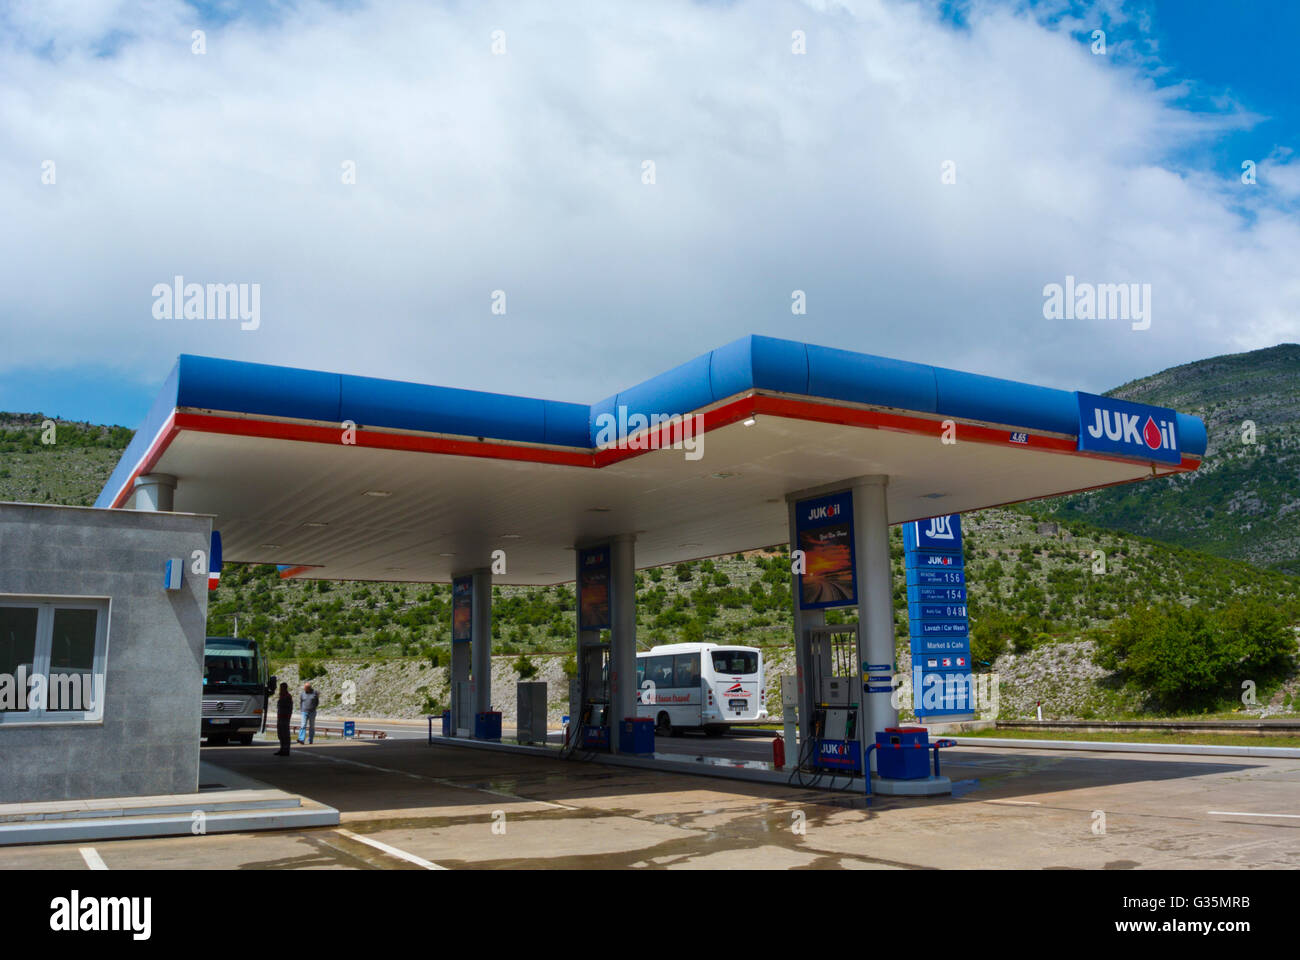 Jukoil, service gas filling station, Hani i Hotit region, near Montenegran border, Albania - Stock Image